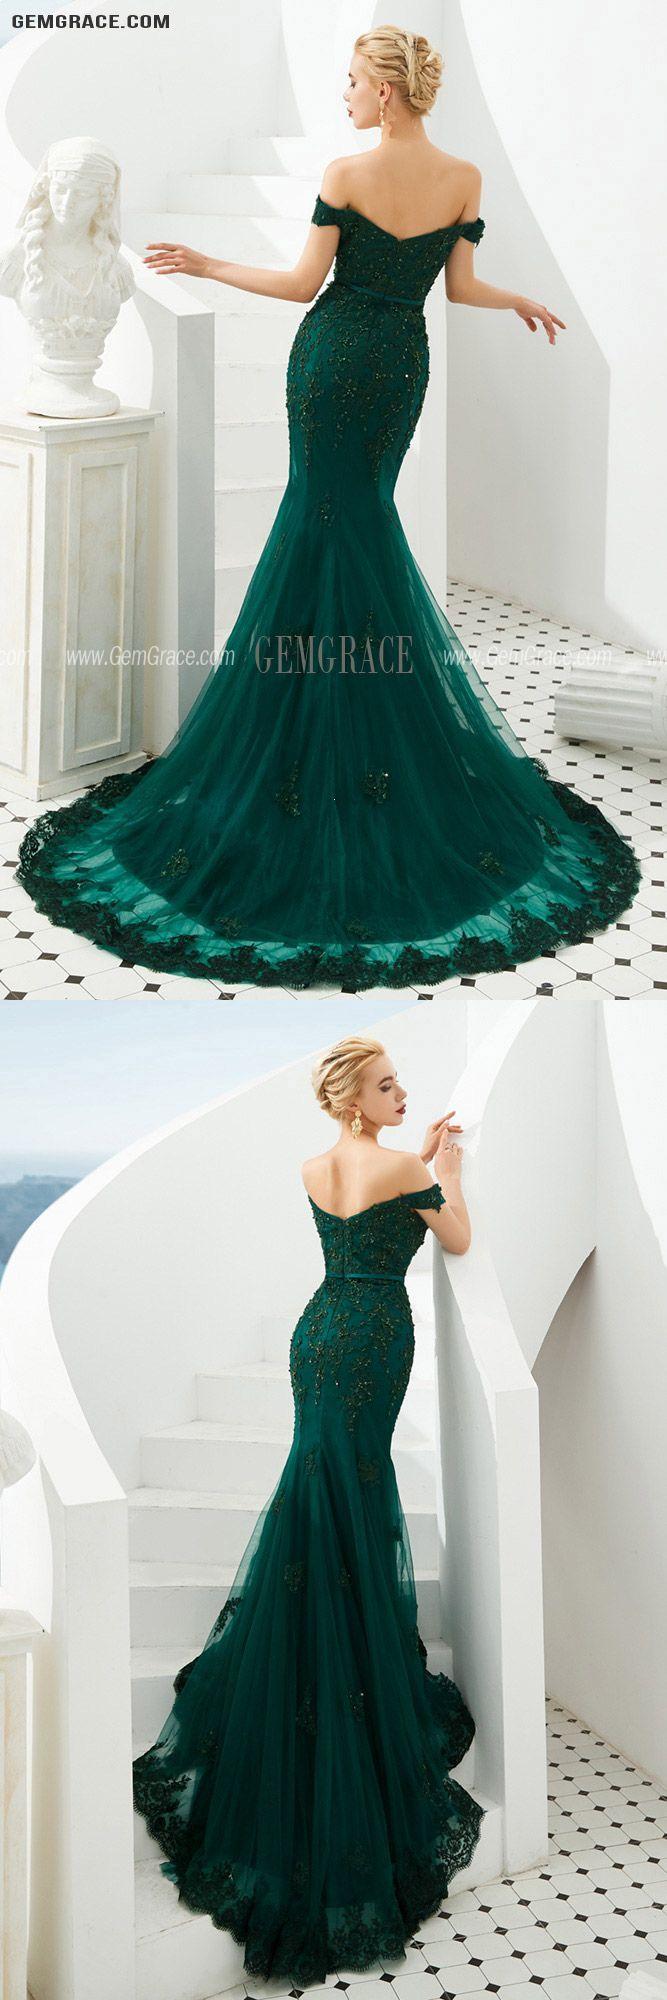 151 89 Mermaid Green Lace Beading Prom Formal Dress With Off Shoulder Strap Ez35338 Gemgrace Com Formal Dresses Award Show Dresses Mermaid Evening Dresses [ 2000 x 667 Pixel ]